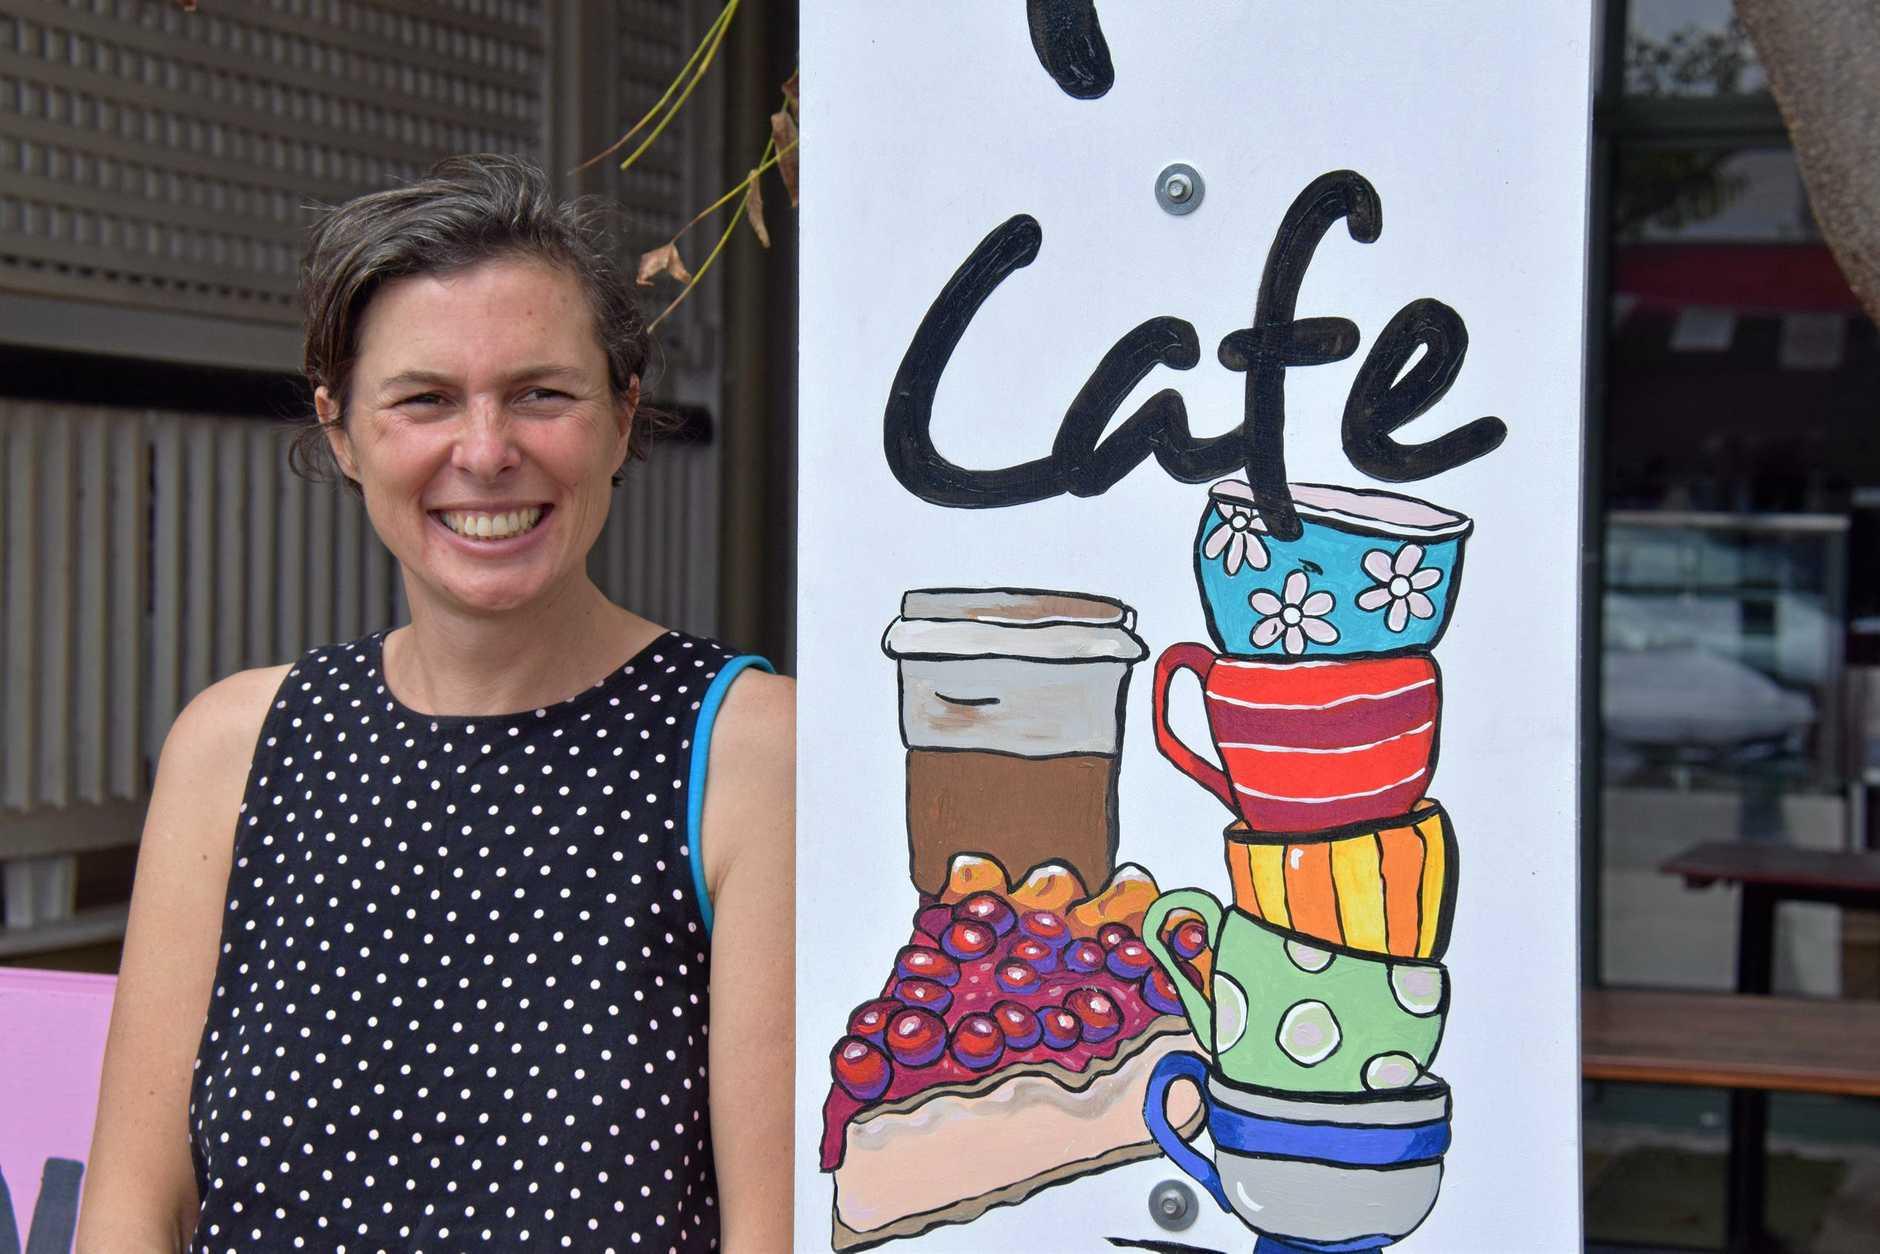 FRESH START: Monique De Martin outside her new vegan cafe, Nourish which now has an official open date